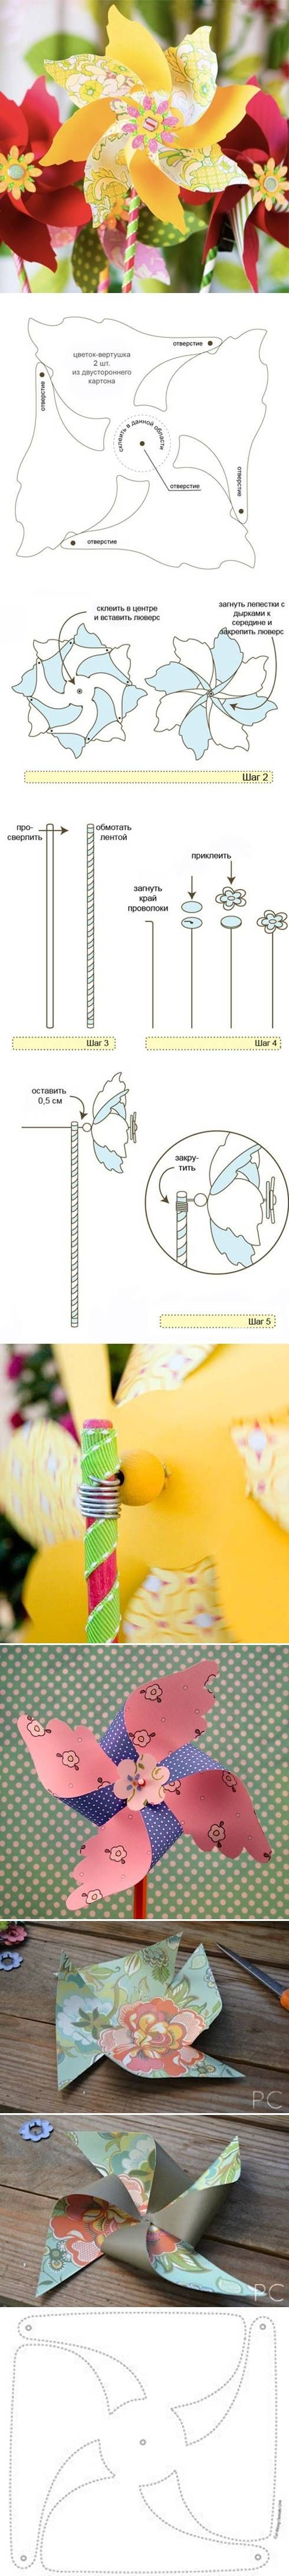 DIY Paper Windmills DIY Projects | UsefulDIY.com